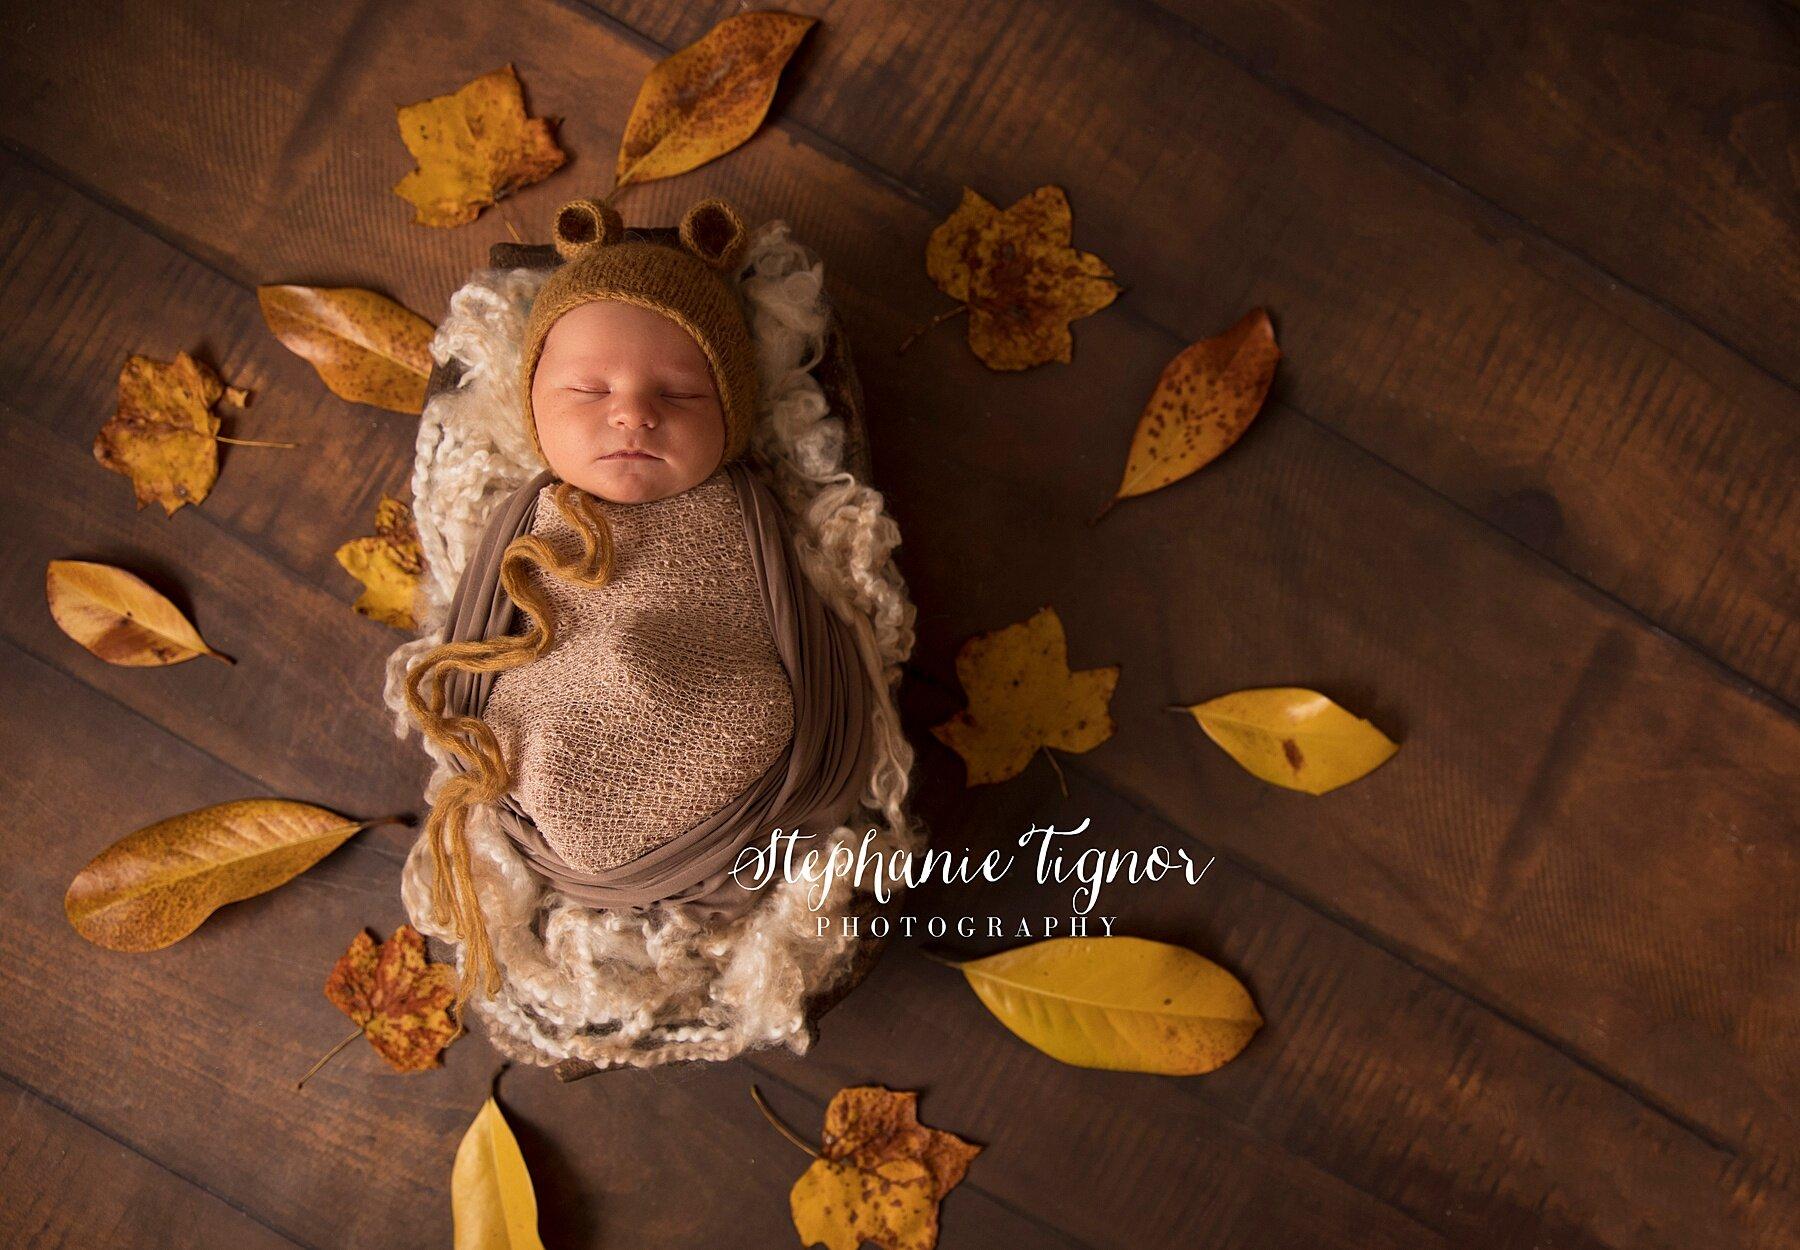 Stephanie Tignor Photography | Fredericksburg VA Newborn Photographer | Warrenton VA Newborn Photographer | Stafford VA Newborn Photographer | Newborn Photographer, fall newborn portraits, autumn portraits, fall baby boy newborn, newborn photos, Virginia newborn photographer